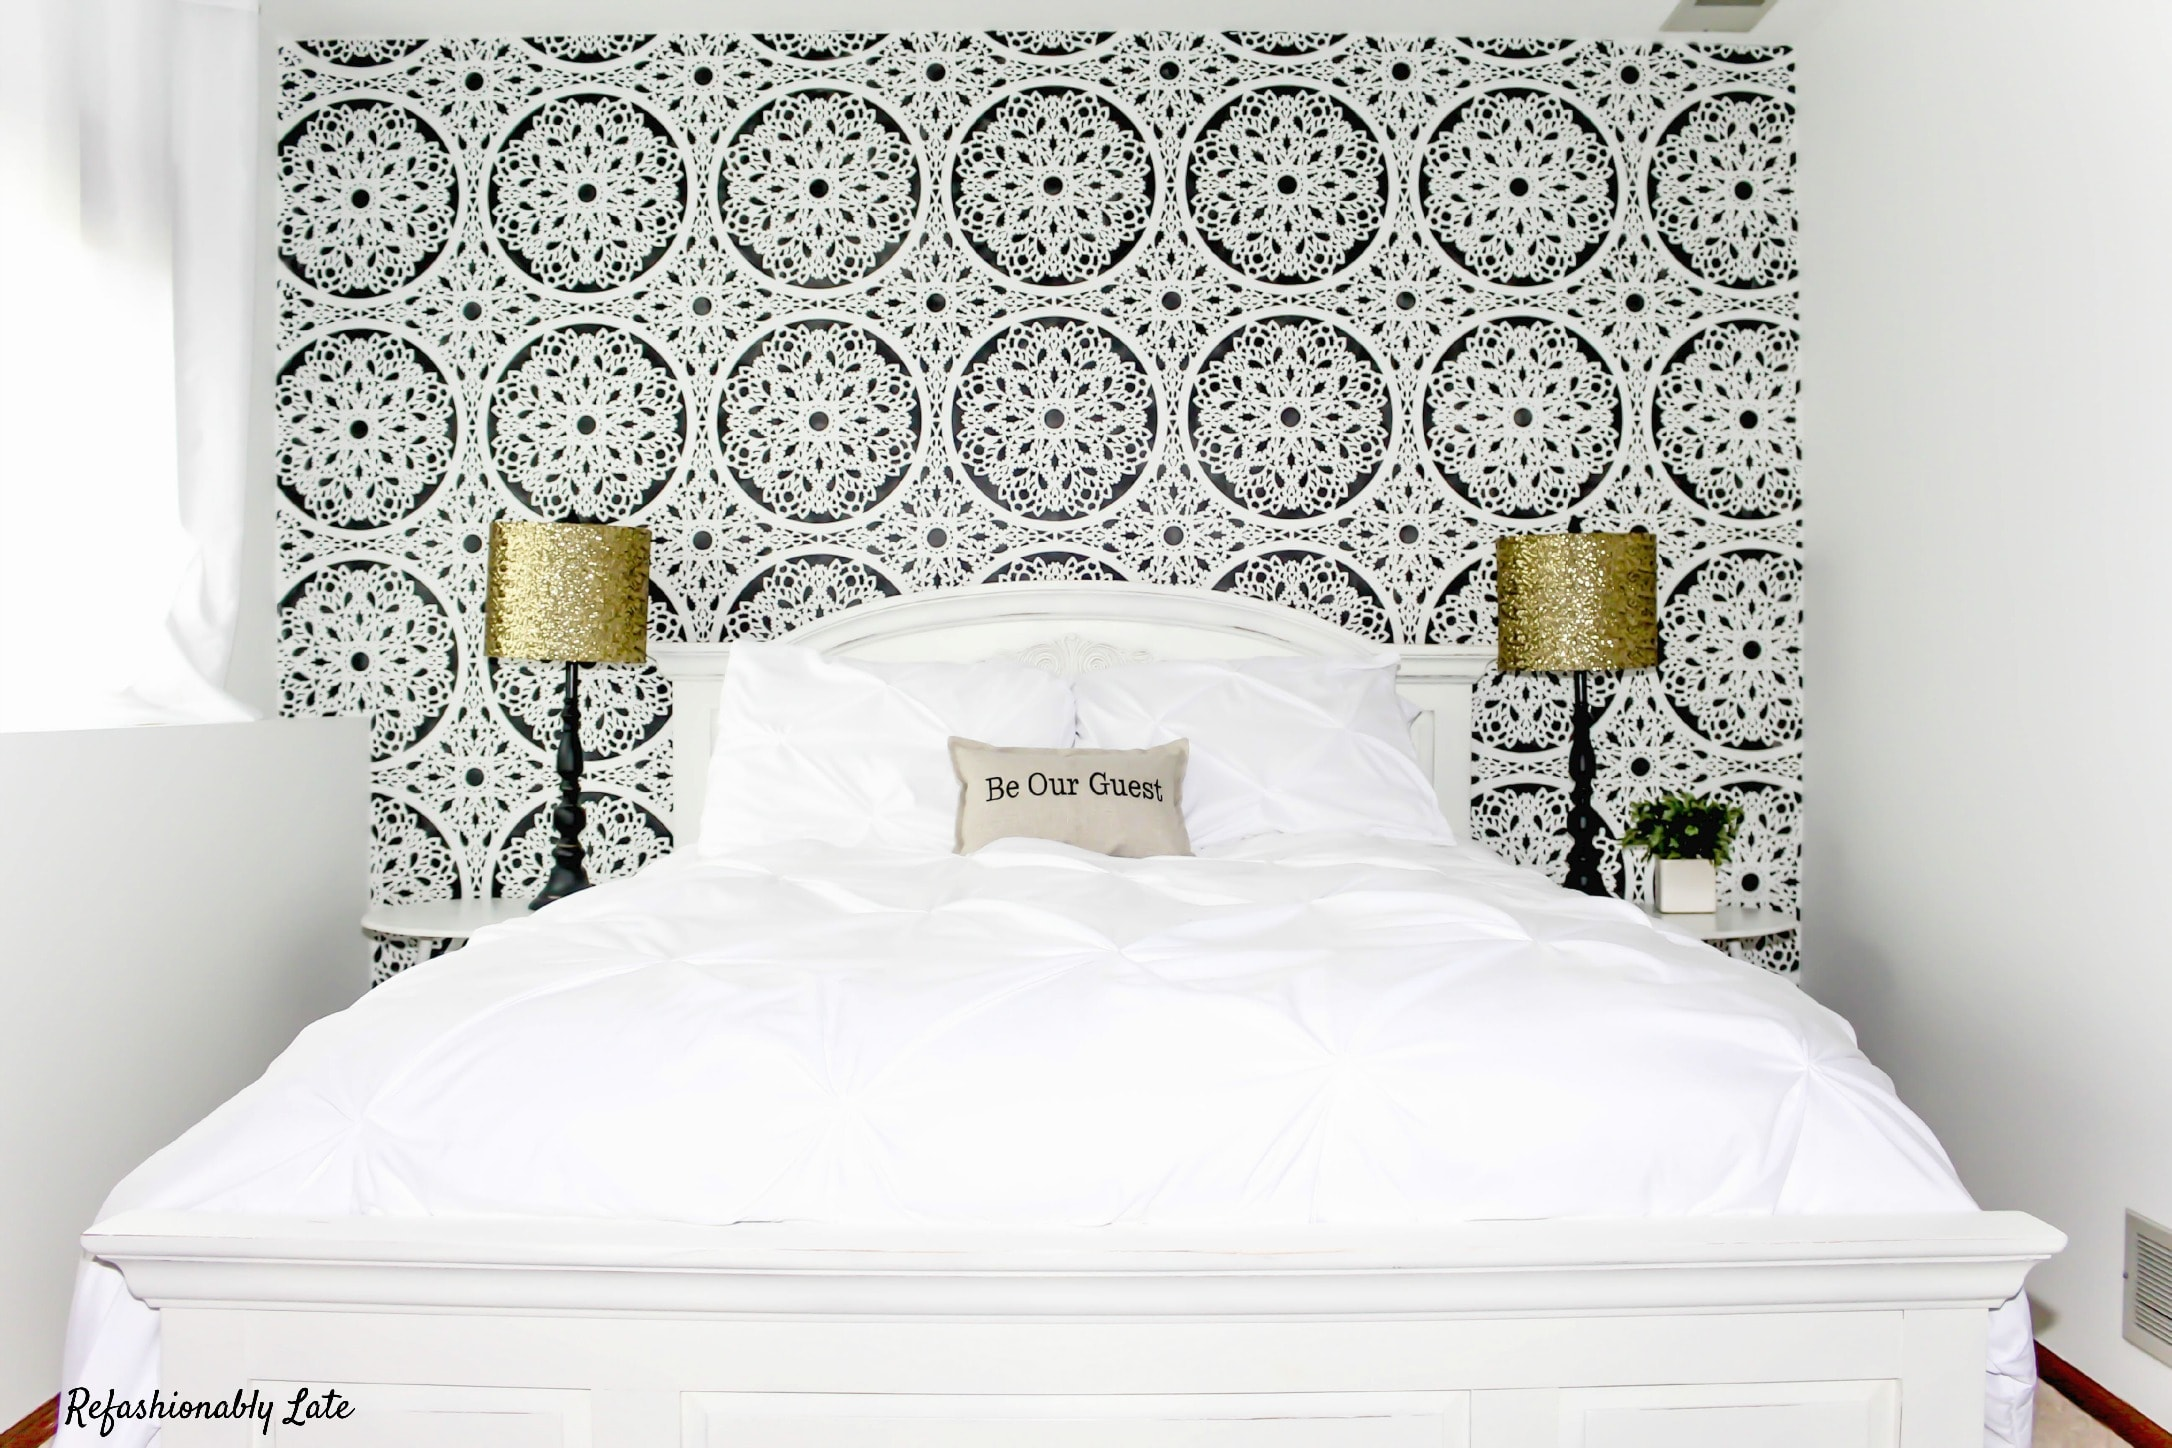 Guest Room Reveal - www.refashionablylate.com